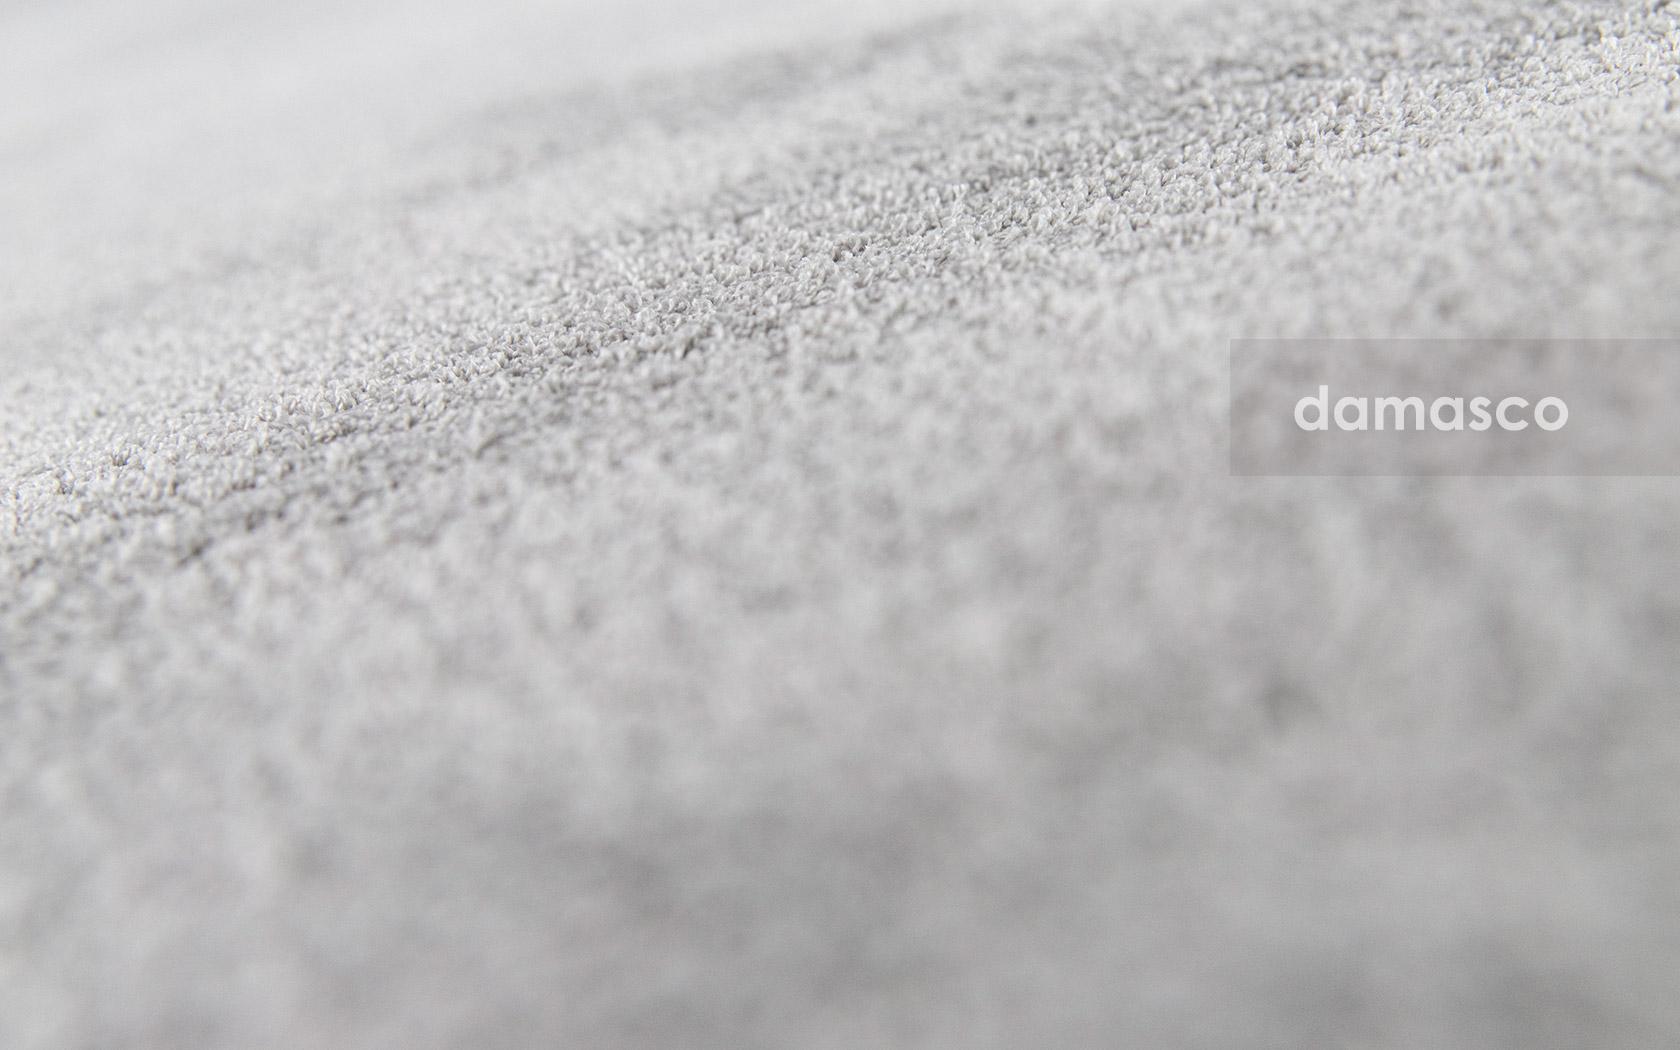 damasco-alfombra-2021-baja-03